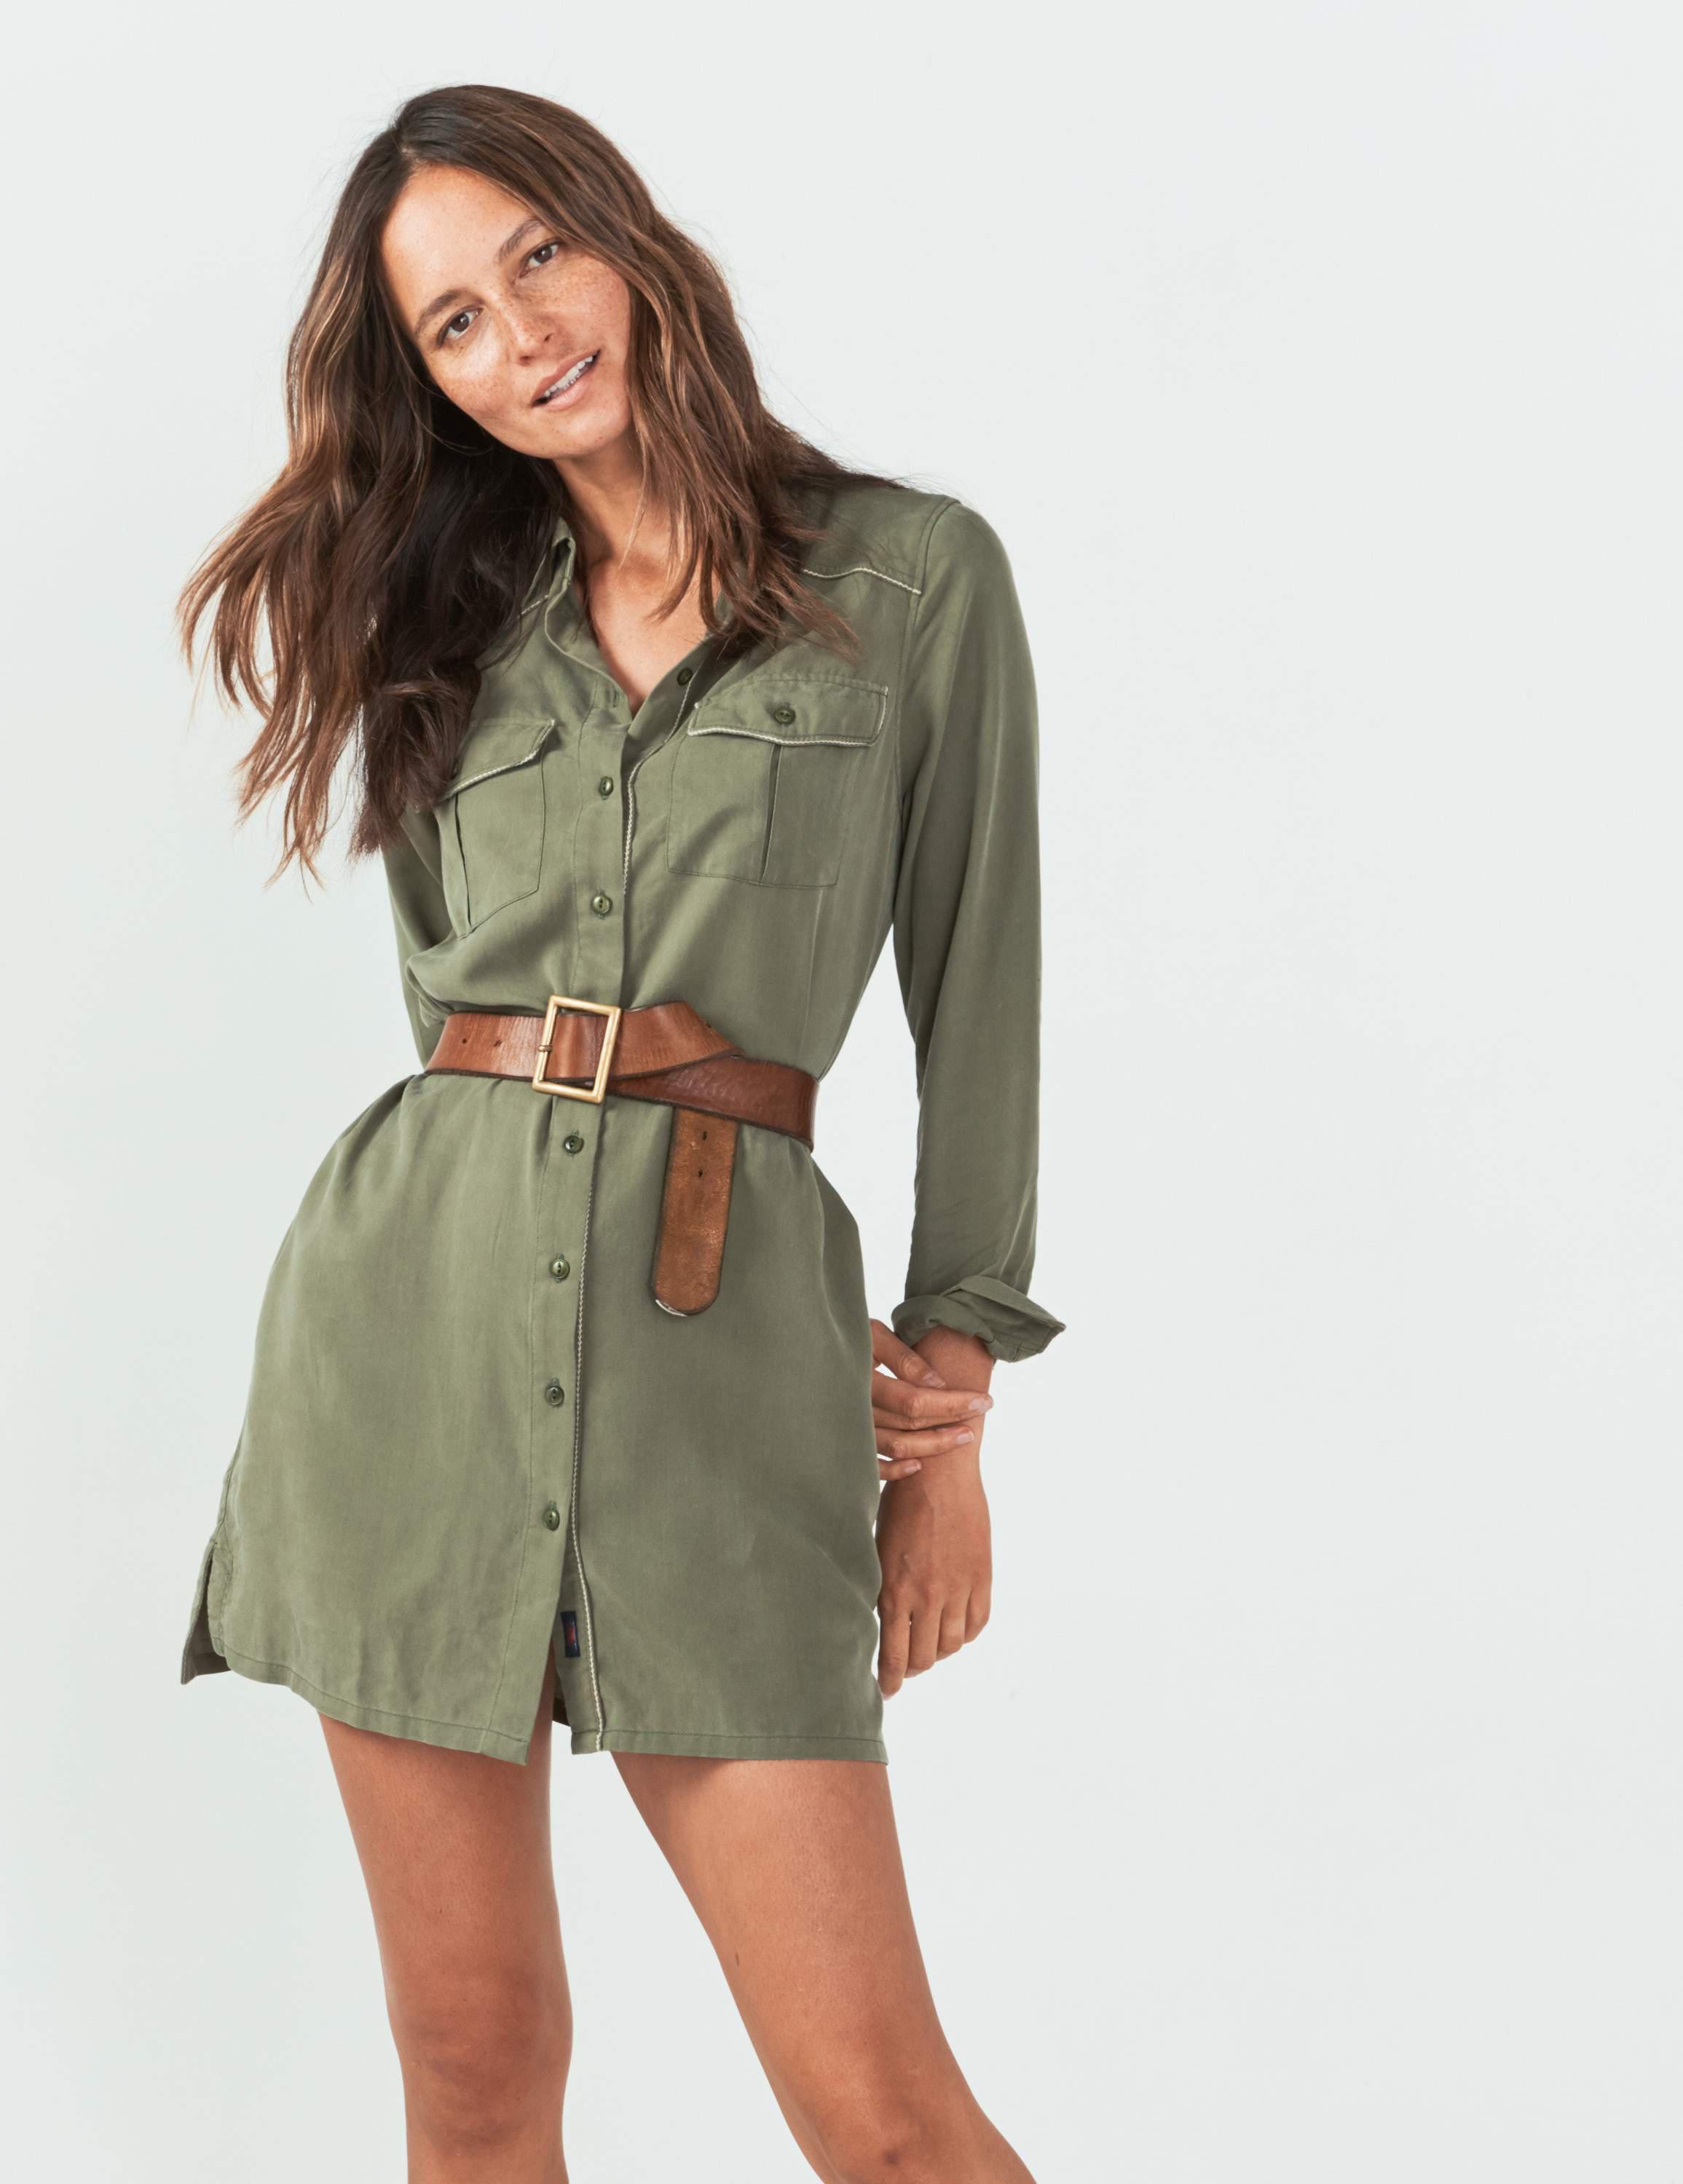 77313c94f7 Faherty Brand Desert Ridge Shirtdress in Green - Save 43.693693693693696% -  Lyst